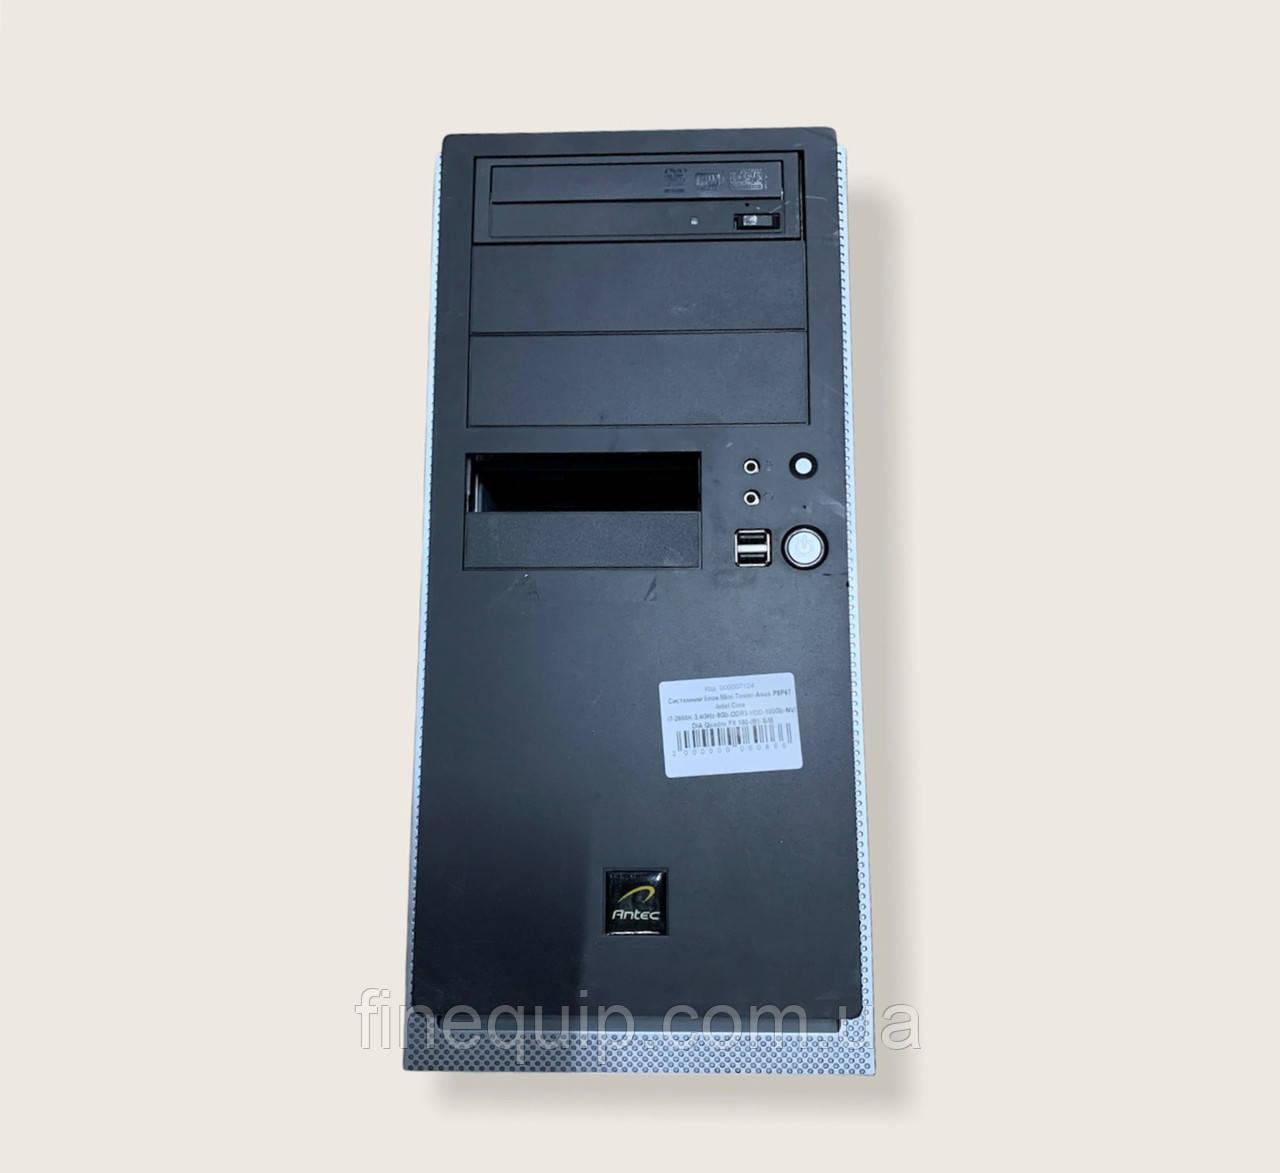 Системный блок-Mini-Tower-Asus P8P67 -Intel Core i7-2600K-3,4GHz-8Gb-DDR3-HDD-500Gb-NVIDIA Quadro FX 580-(B)-